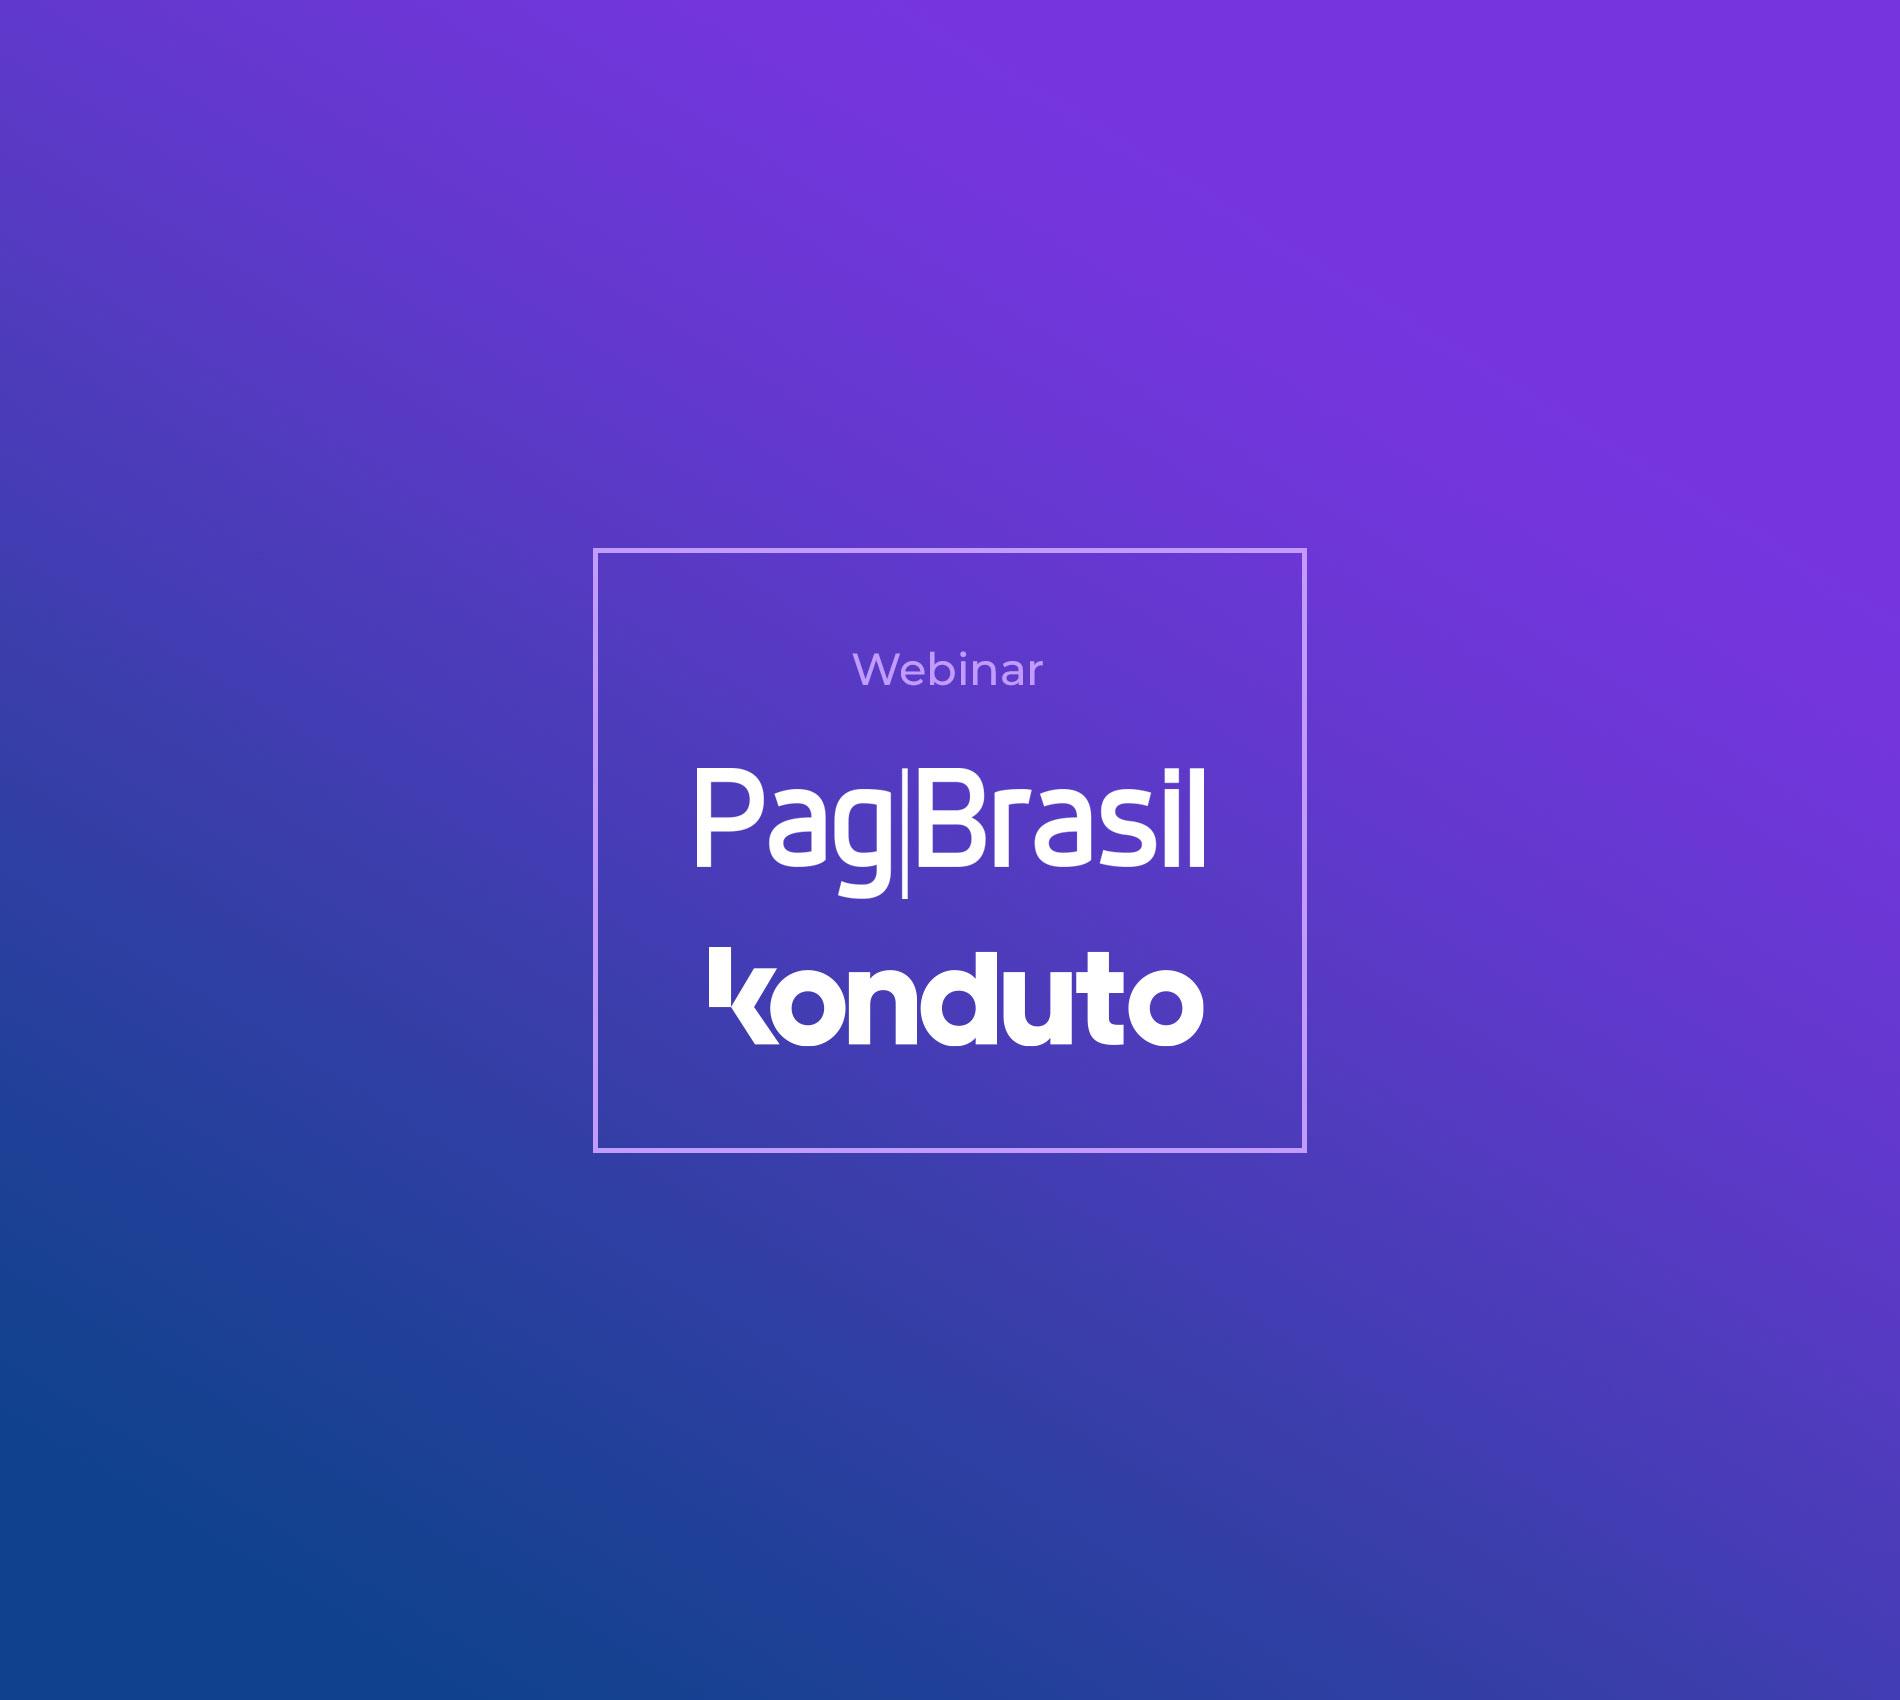 Webinar PagBrasil e Konduto 2020